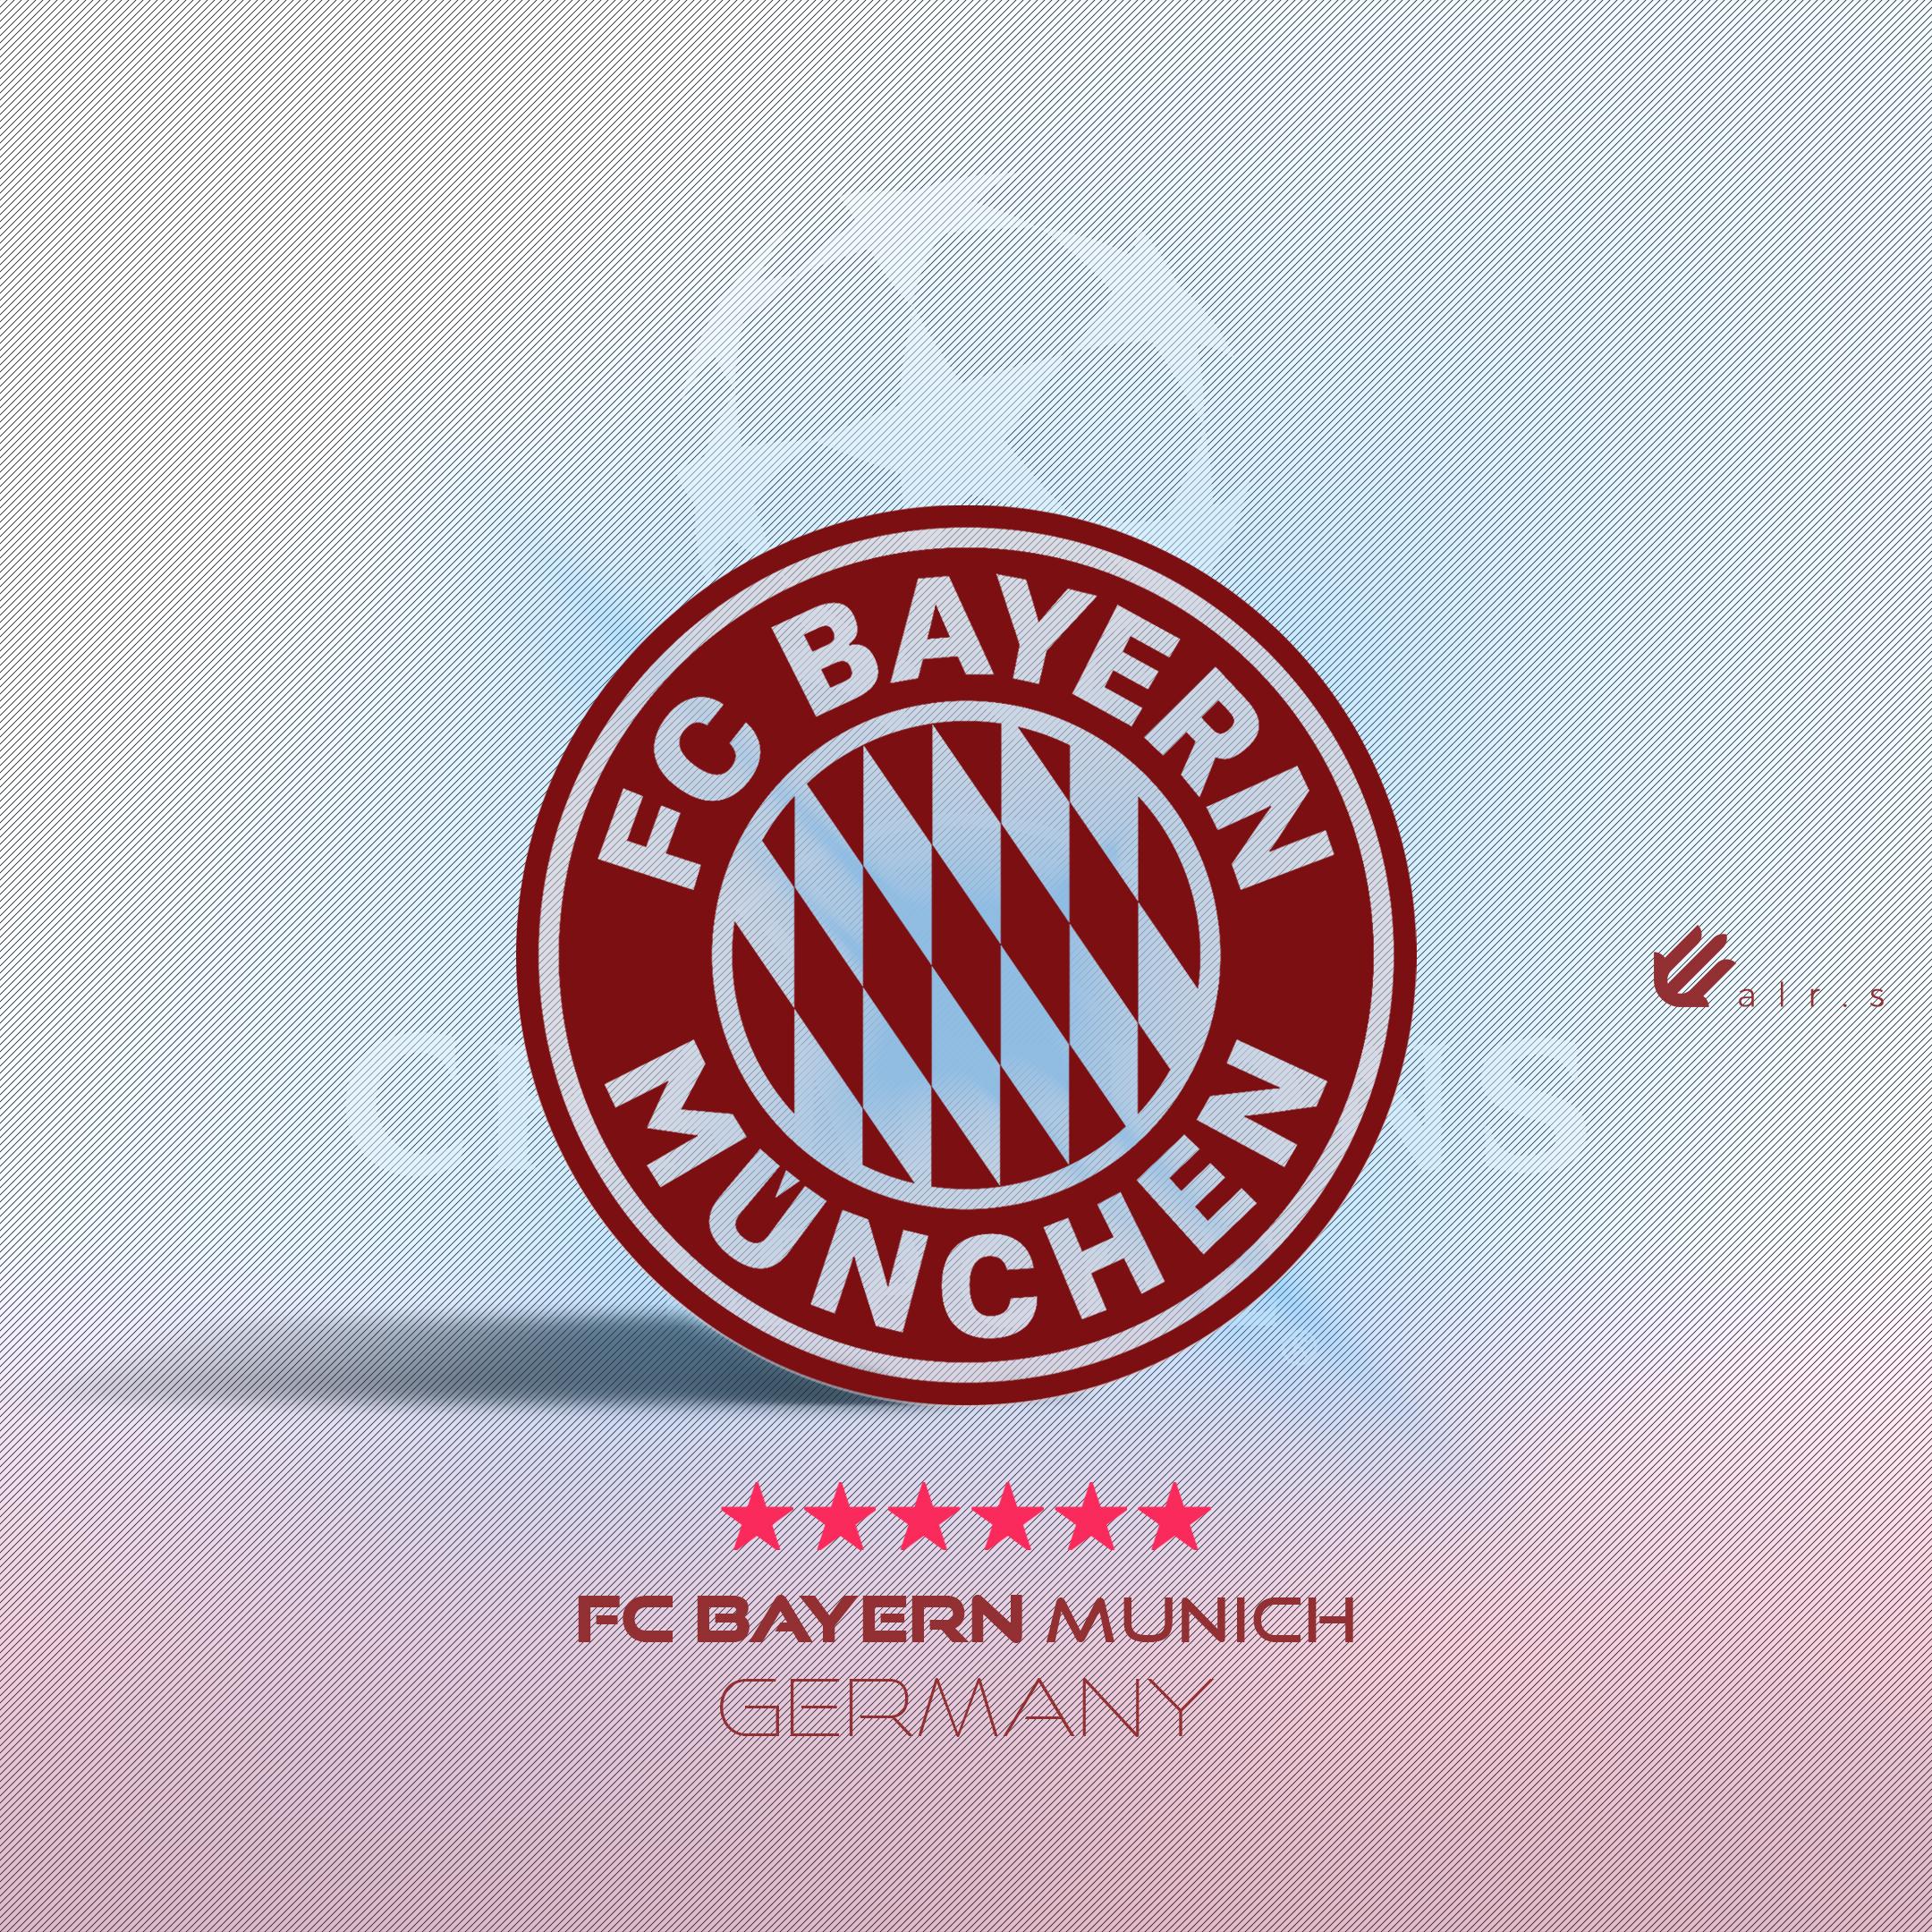 General 2160x2160 Football  Bayern Munich logo Champions League clubs graphic design creativity photography colorful sport  sports soccer soccer clubs Bundesliga